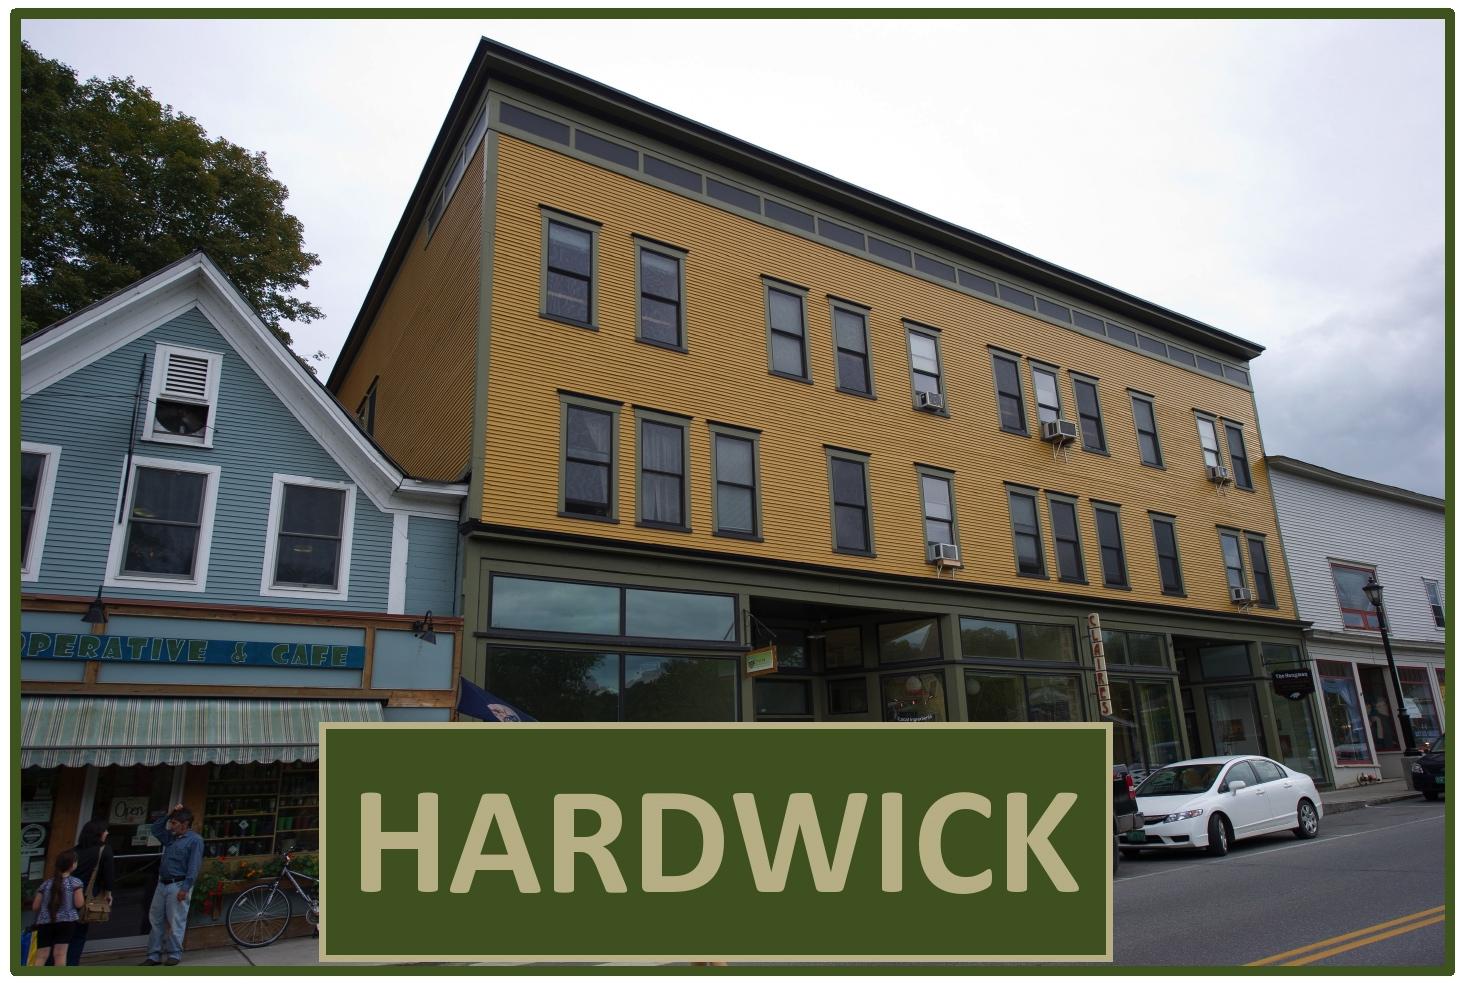 LHP_Bemis Block_Hardwick